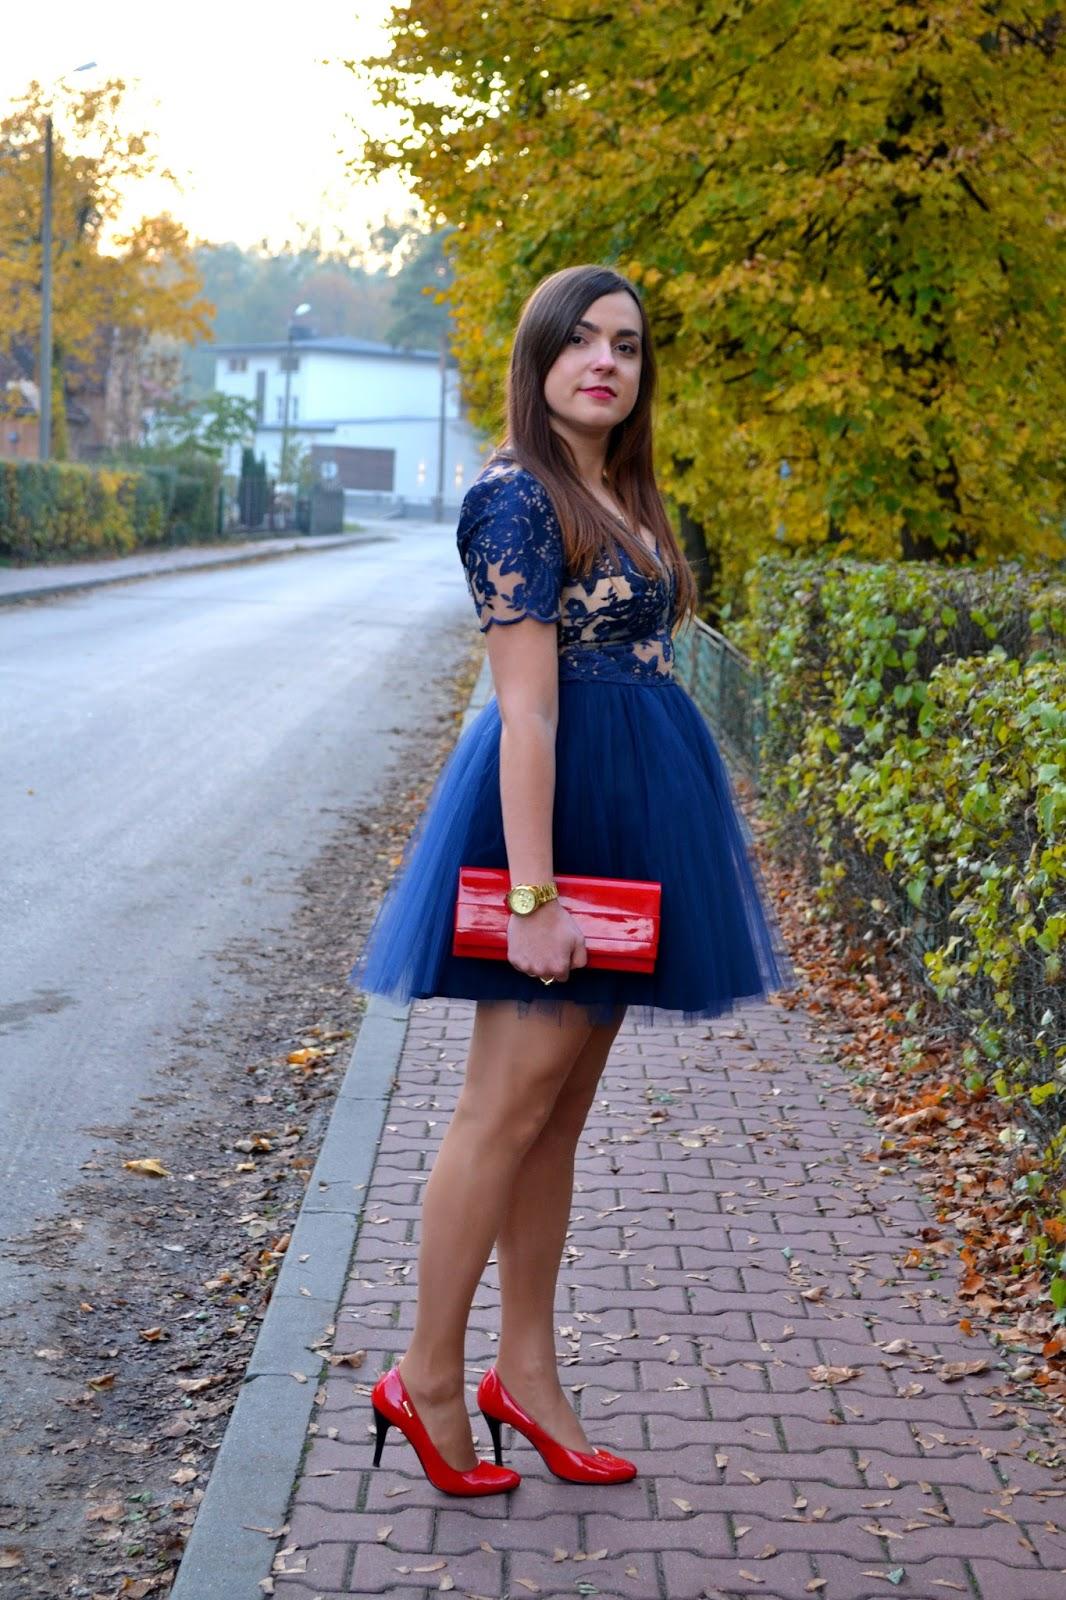 Stylizacja Na Wesele Koronkowa Granatowa Tiulowa Sukienka Moda